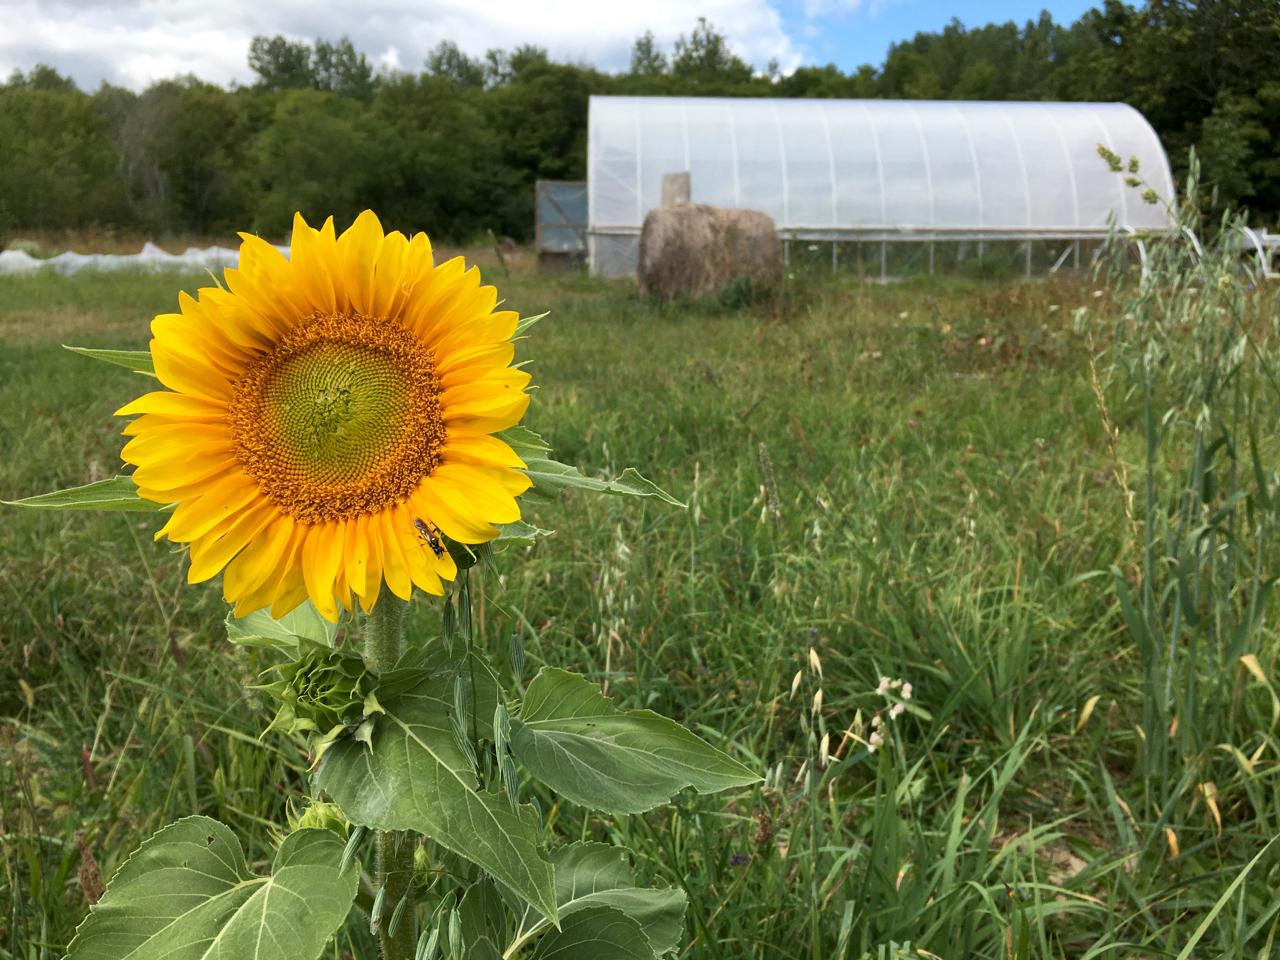 sunflower hoop house bird's nest garden farm